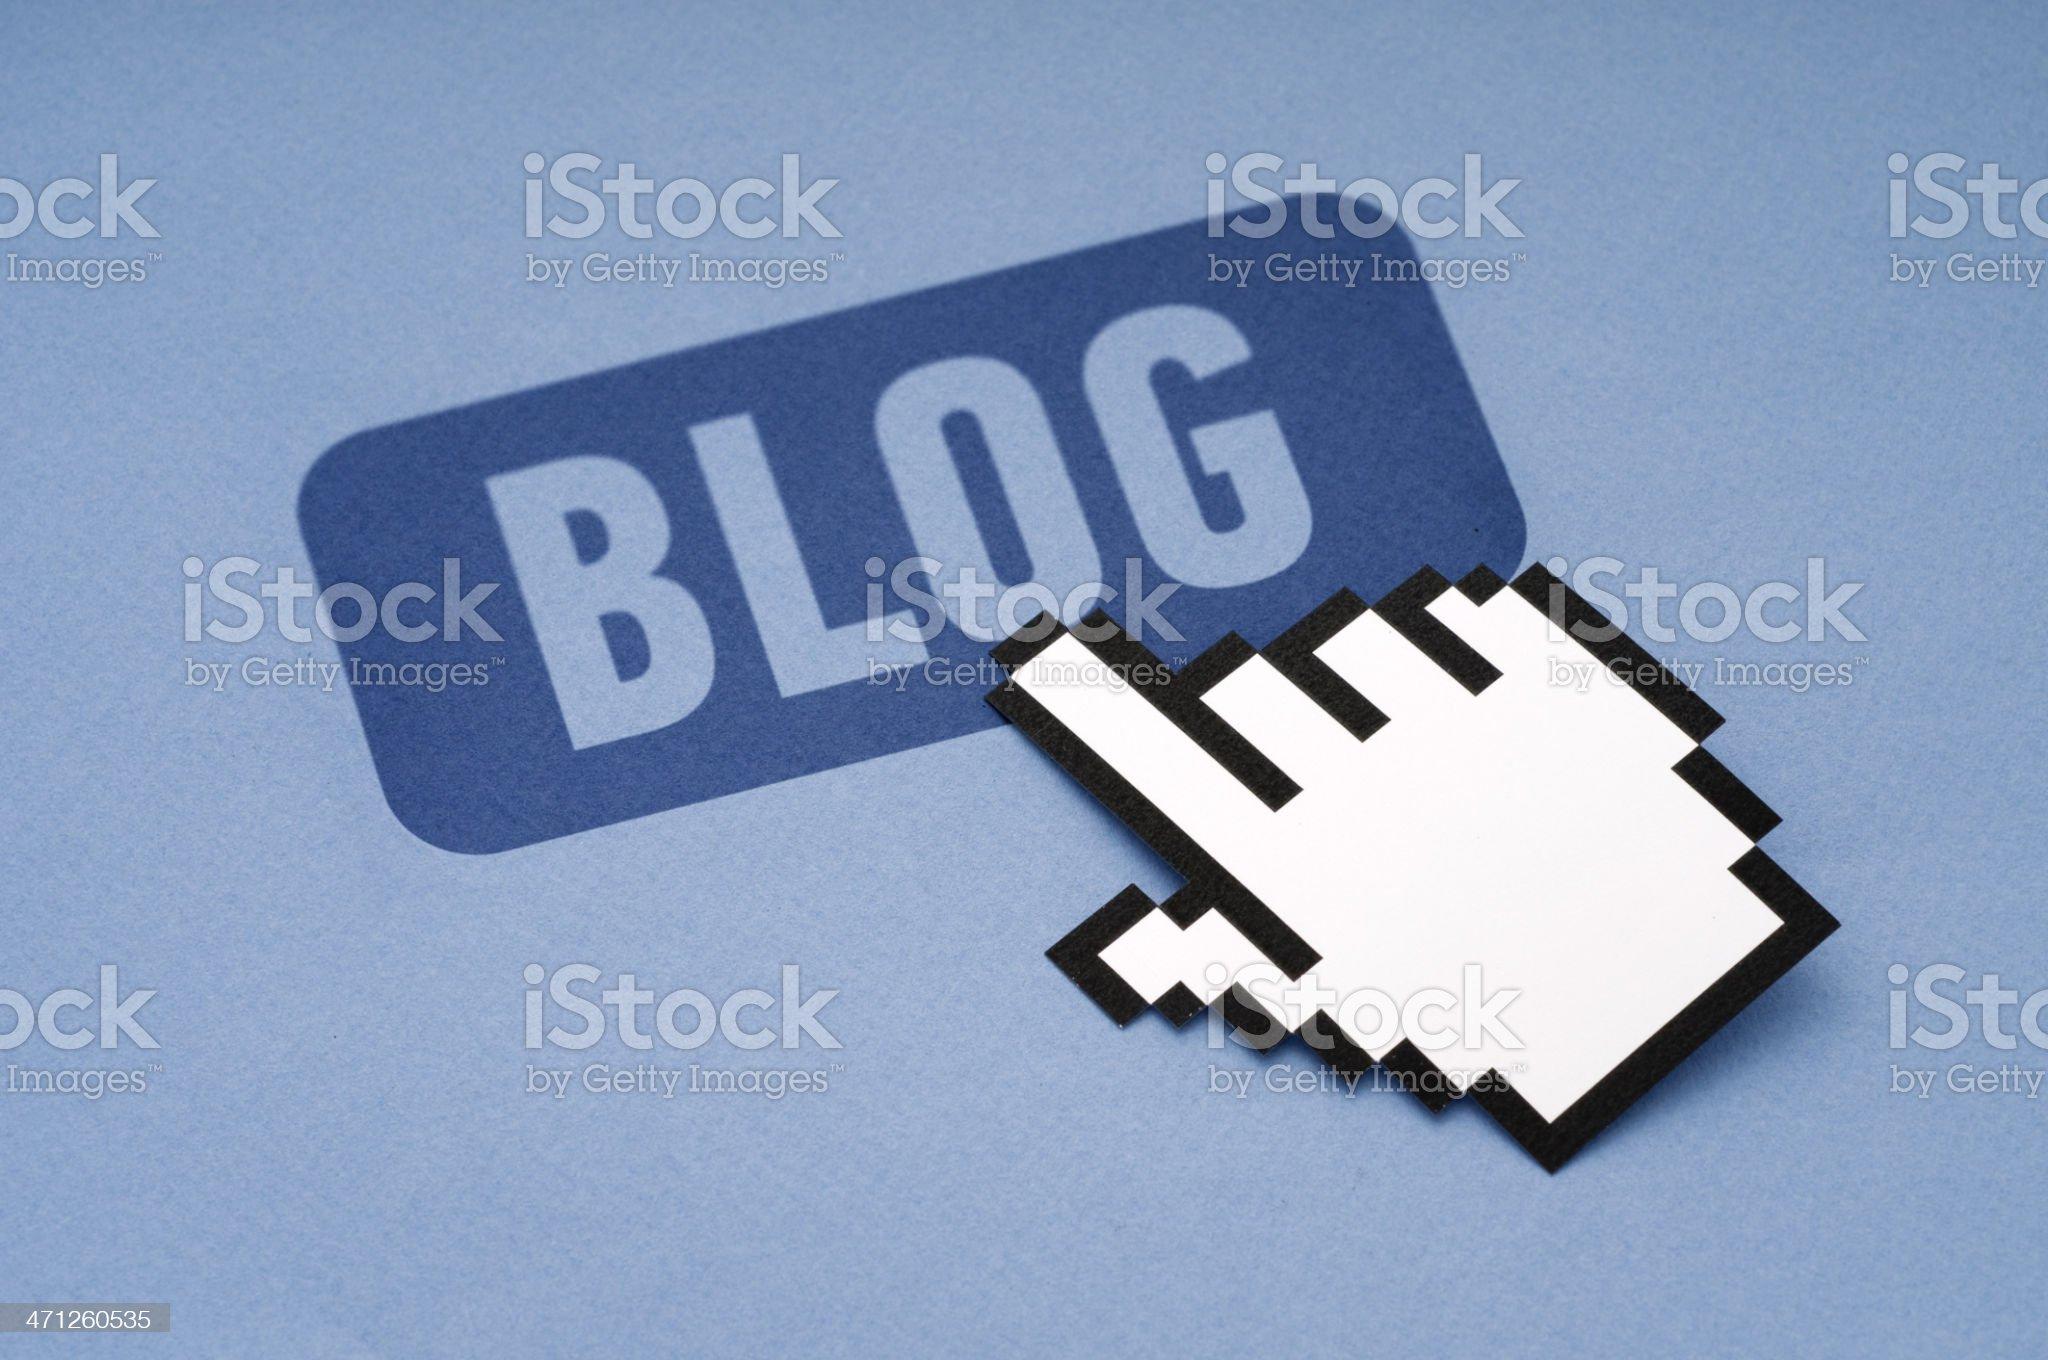 Blog royalty-free stock photo